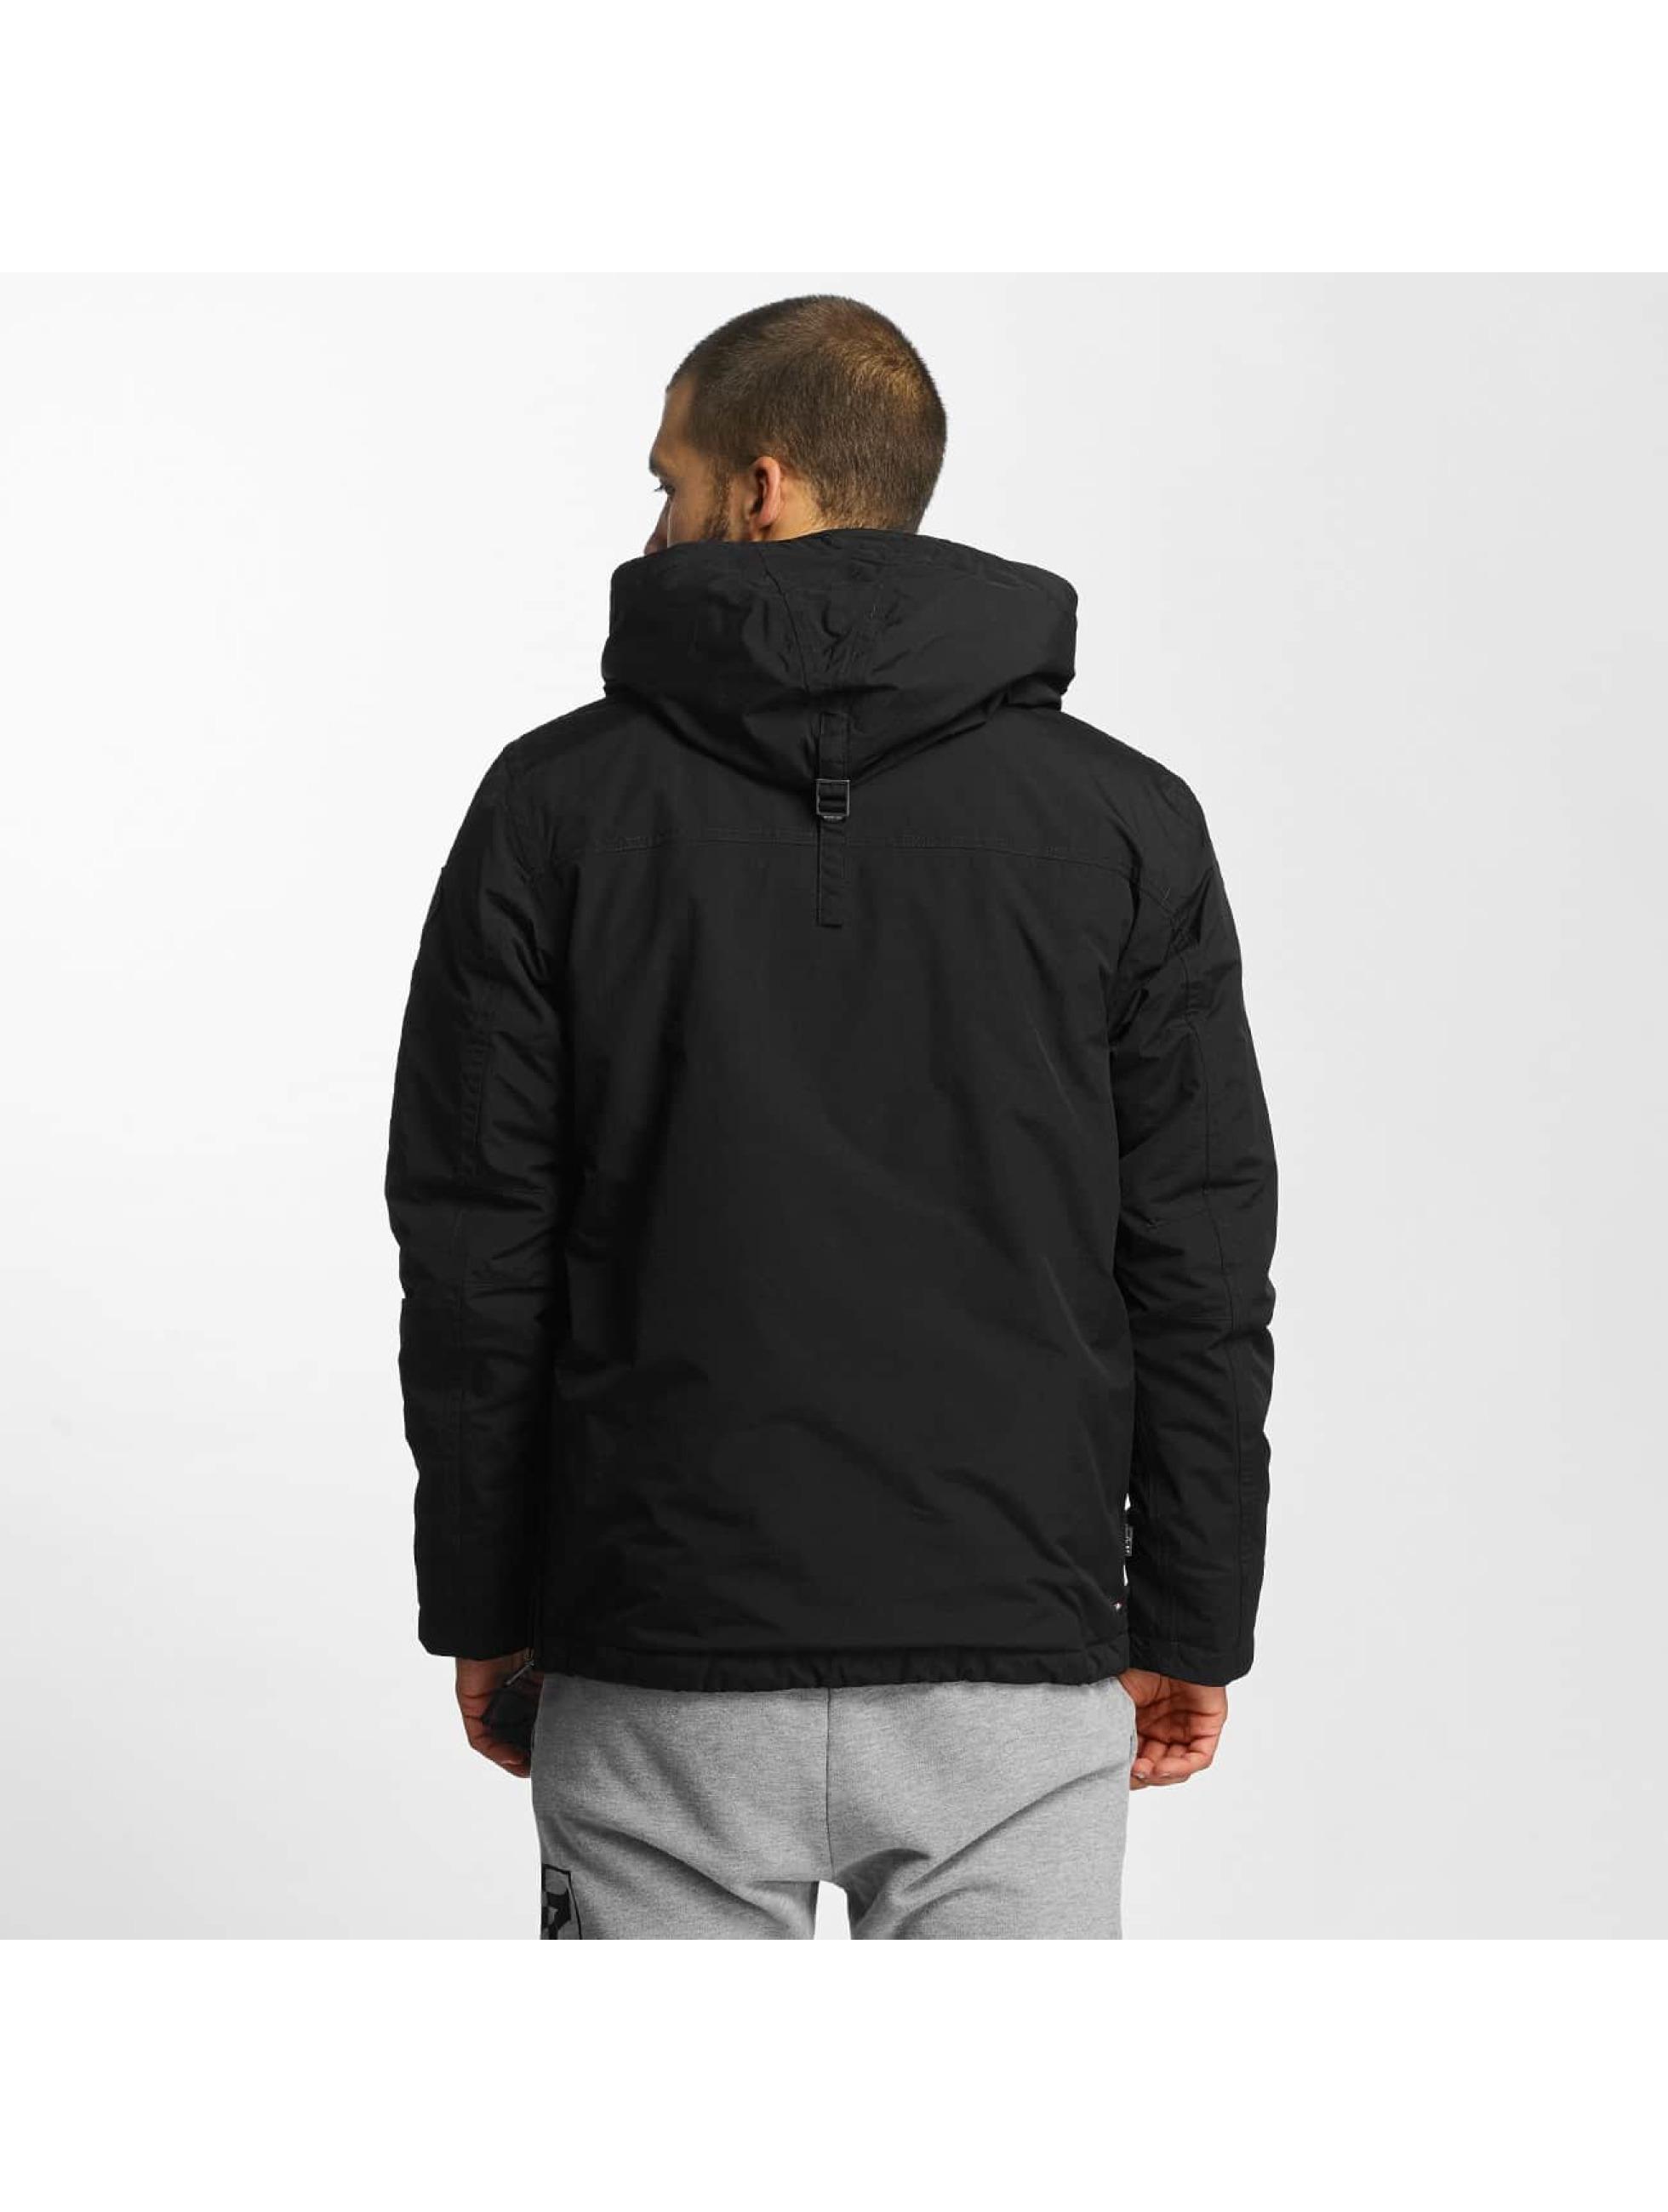 Napapijri Winter Jacket Rainforest black